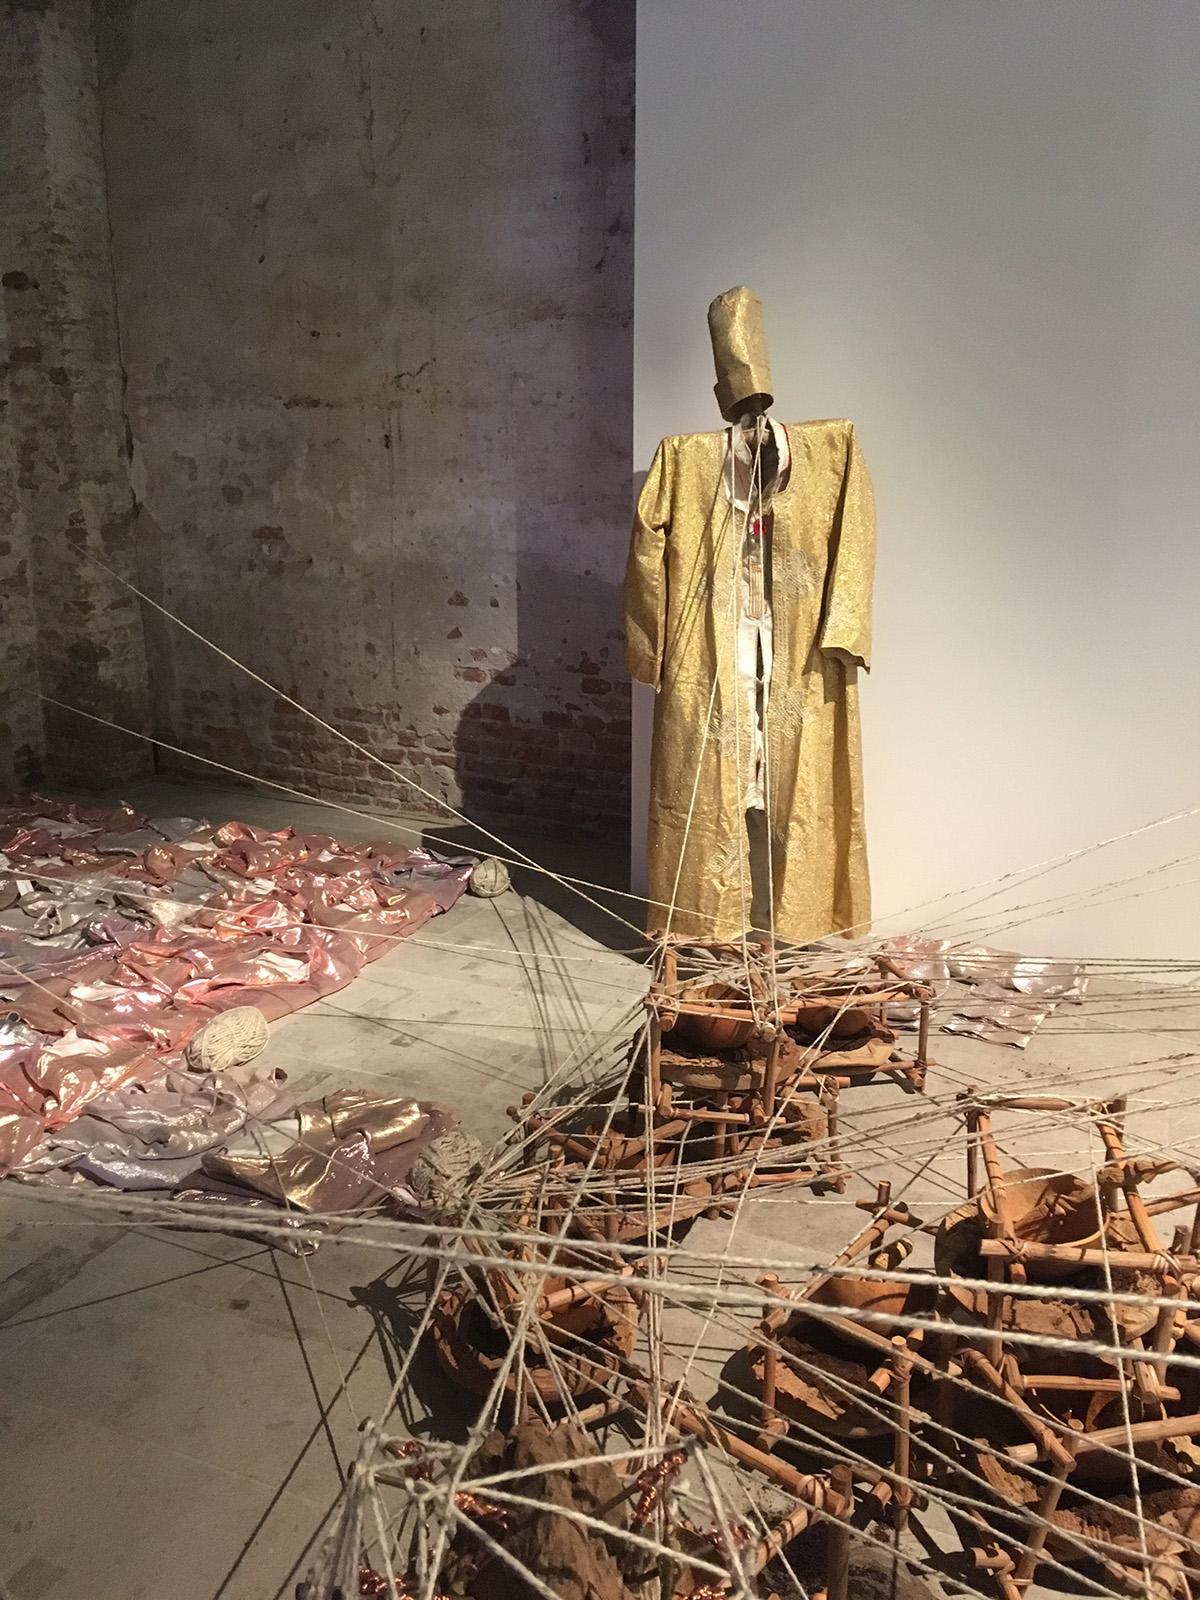 performance-jelili-atiku-biennale-venise-installation